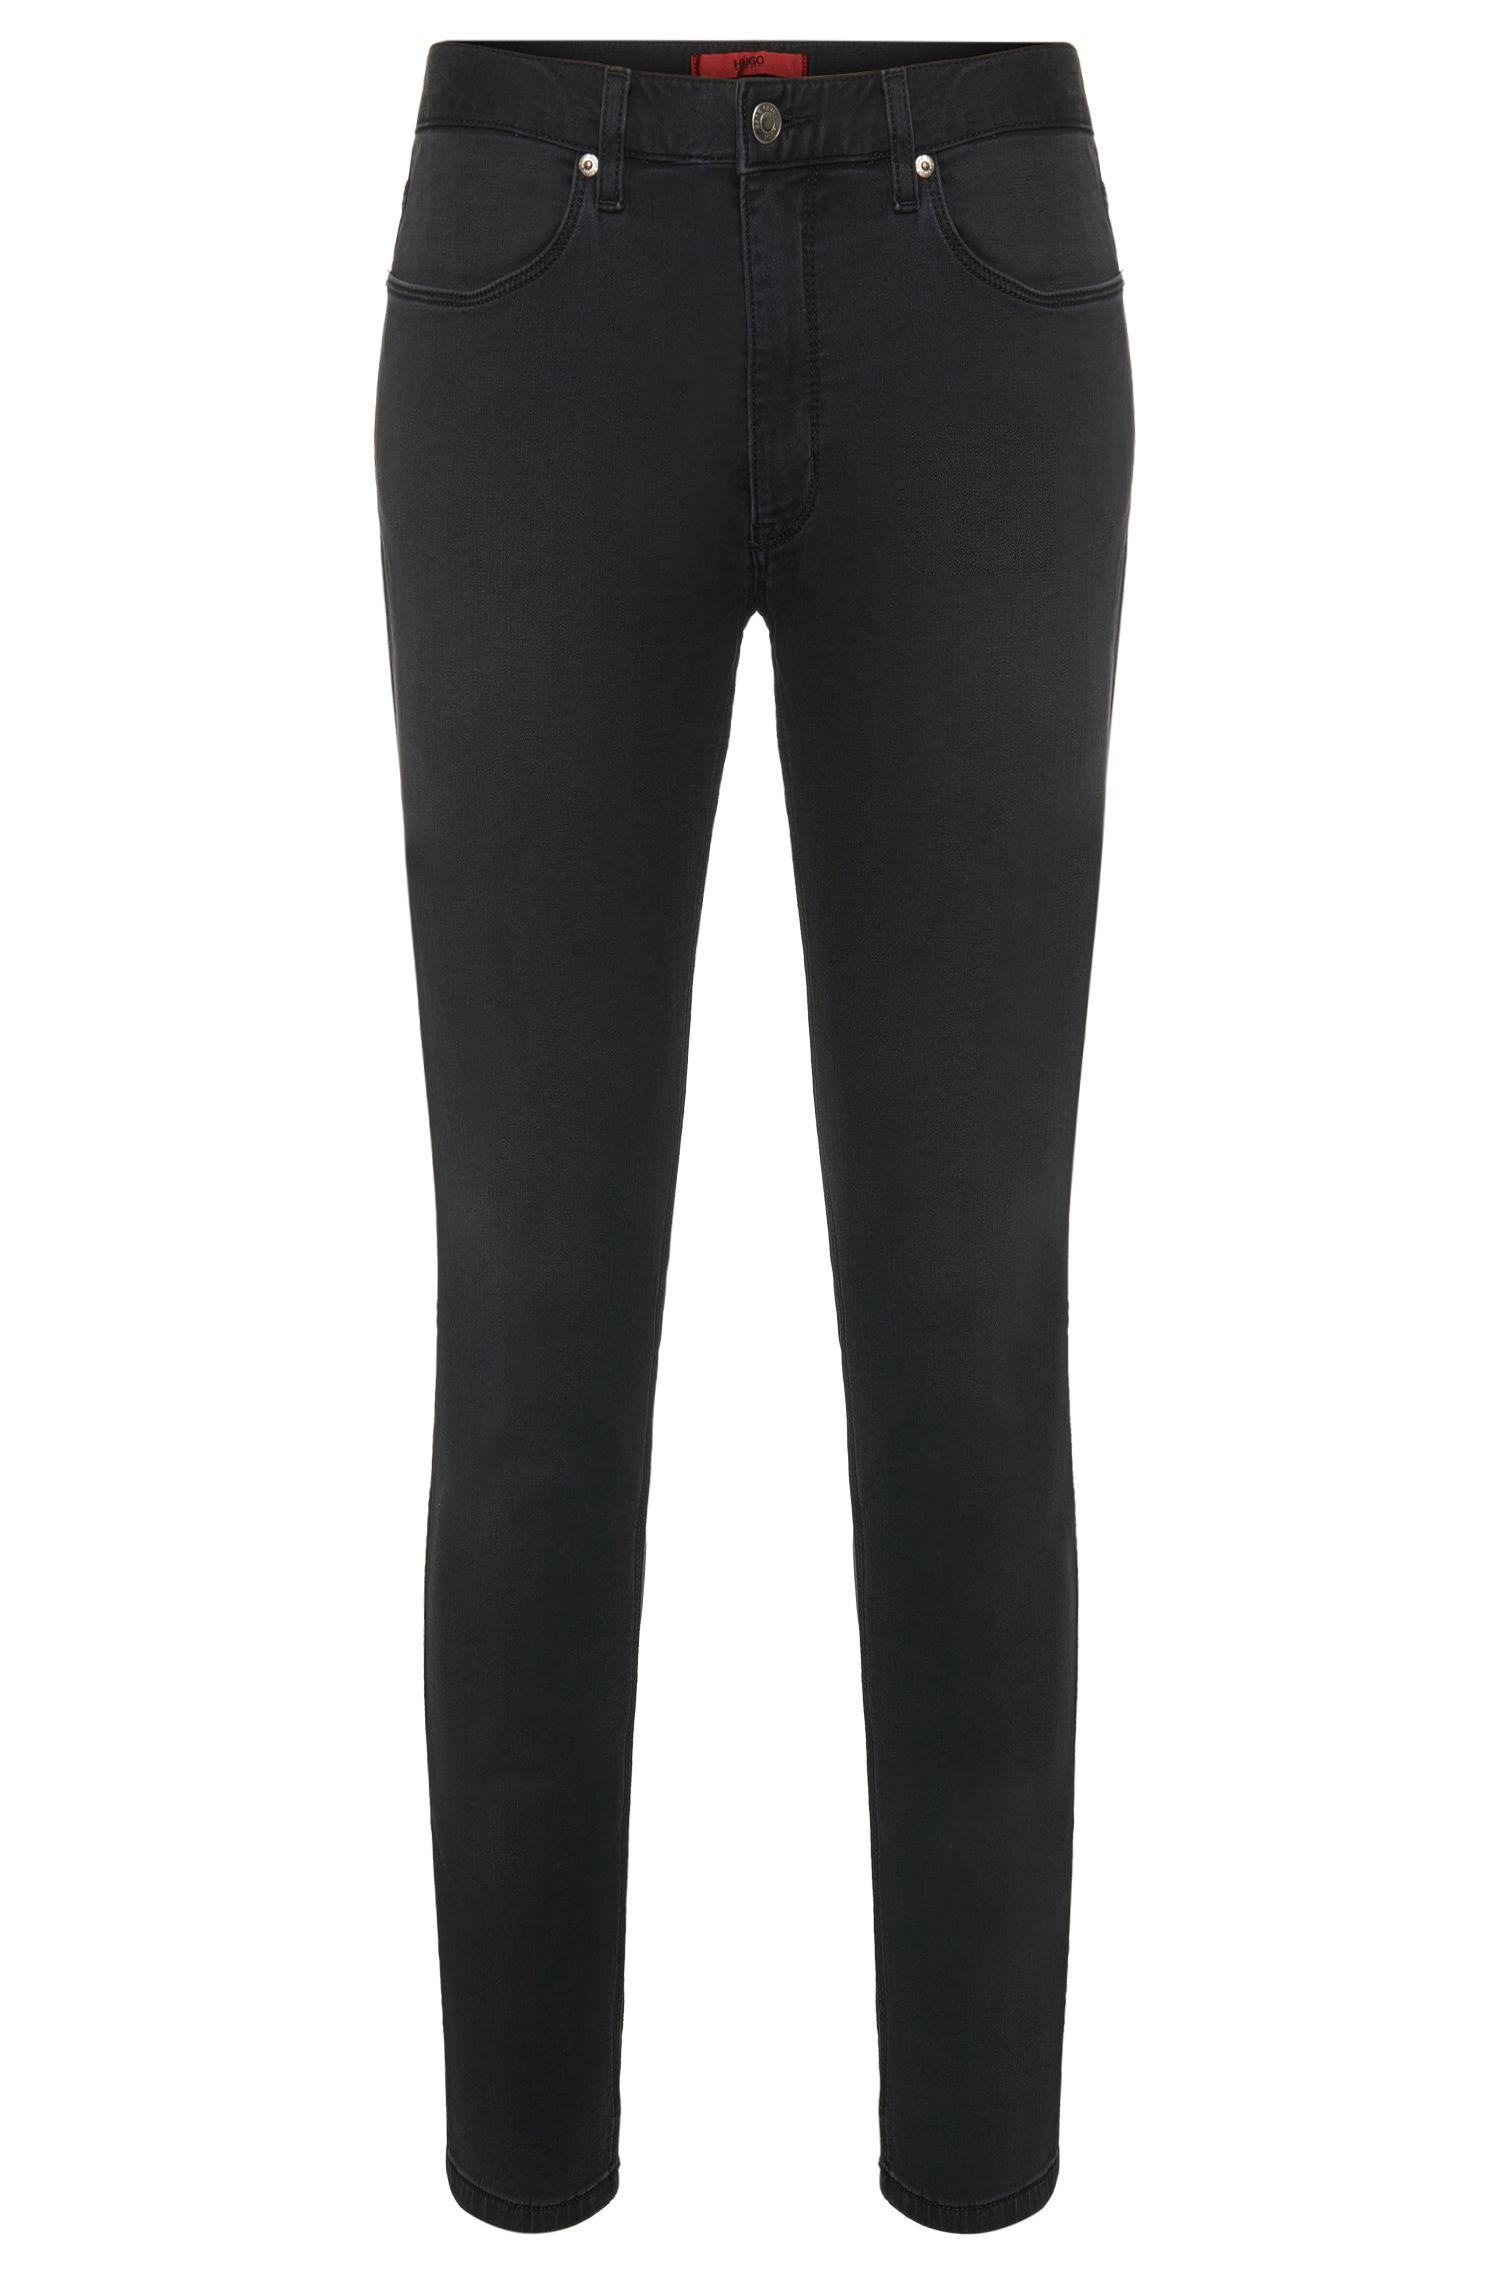 'HUGO 734' | Skinny Fit, 10.5 oz Stretch Cotton Blend Jeans